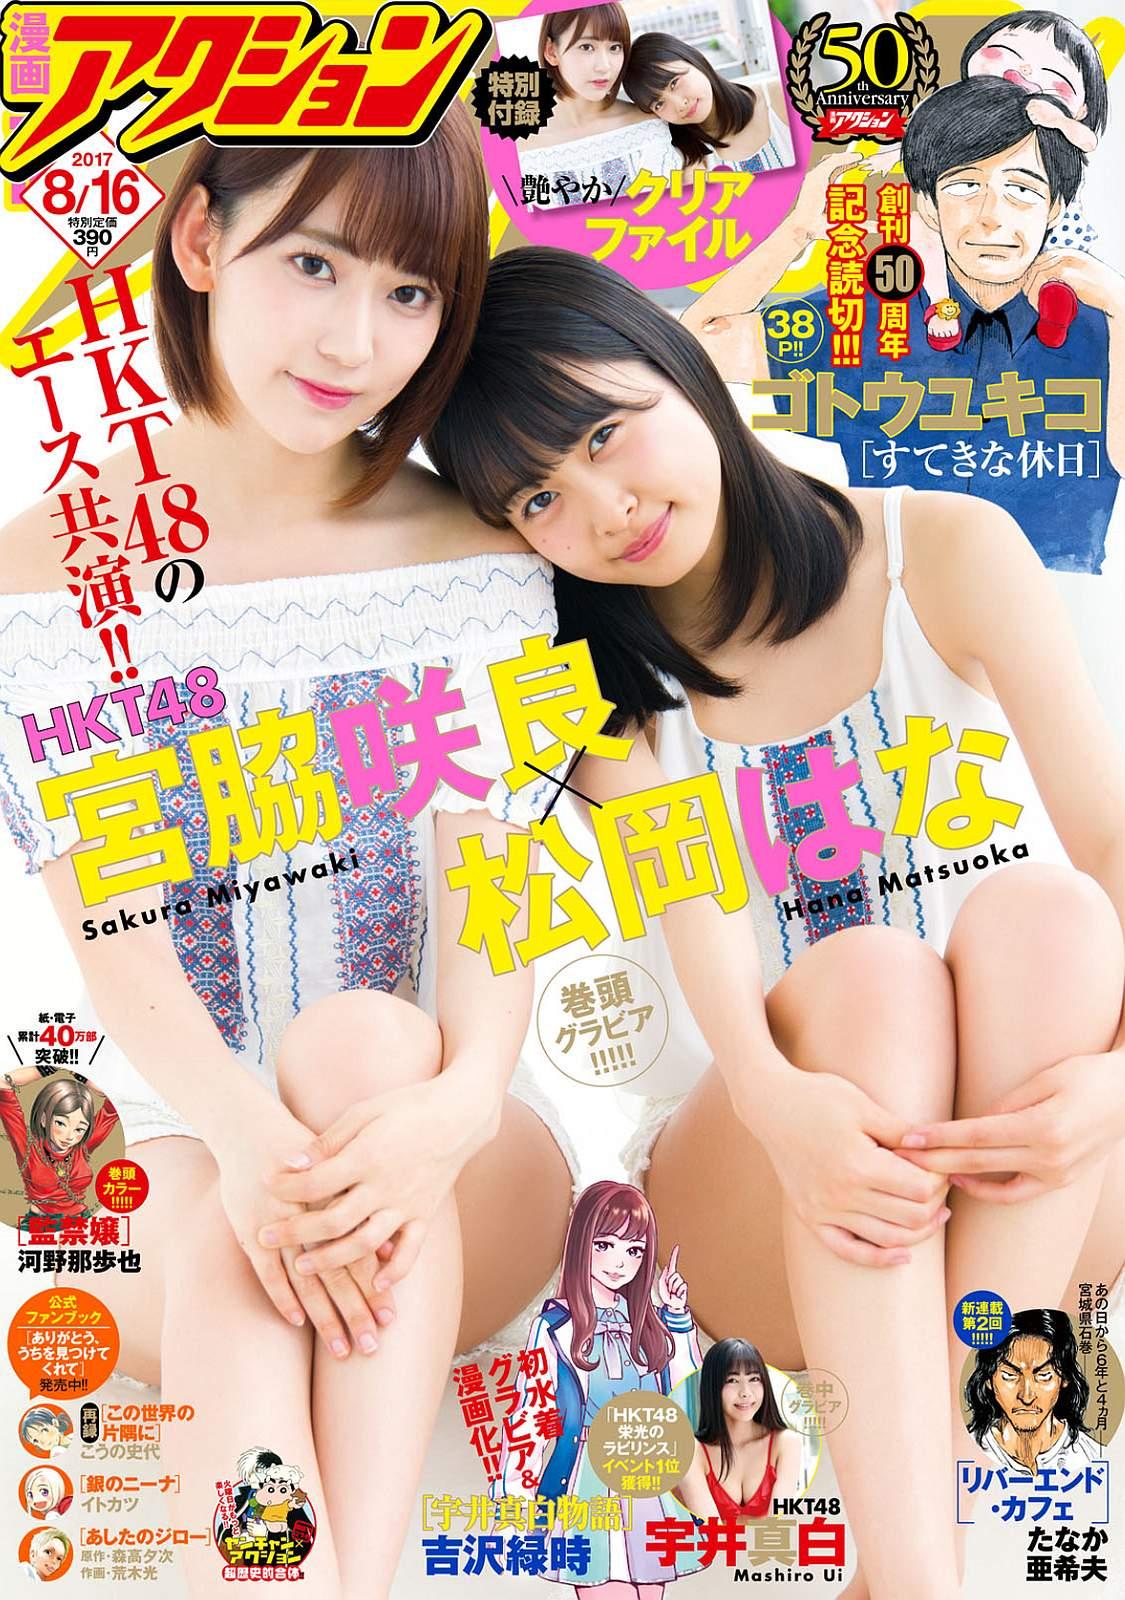 Miyawaki Sakura 宮脇咲良, Matsuoka Hana 松岡はな, Manga Action 2017 No.16 (漫画アクション 2017年16号)